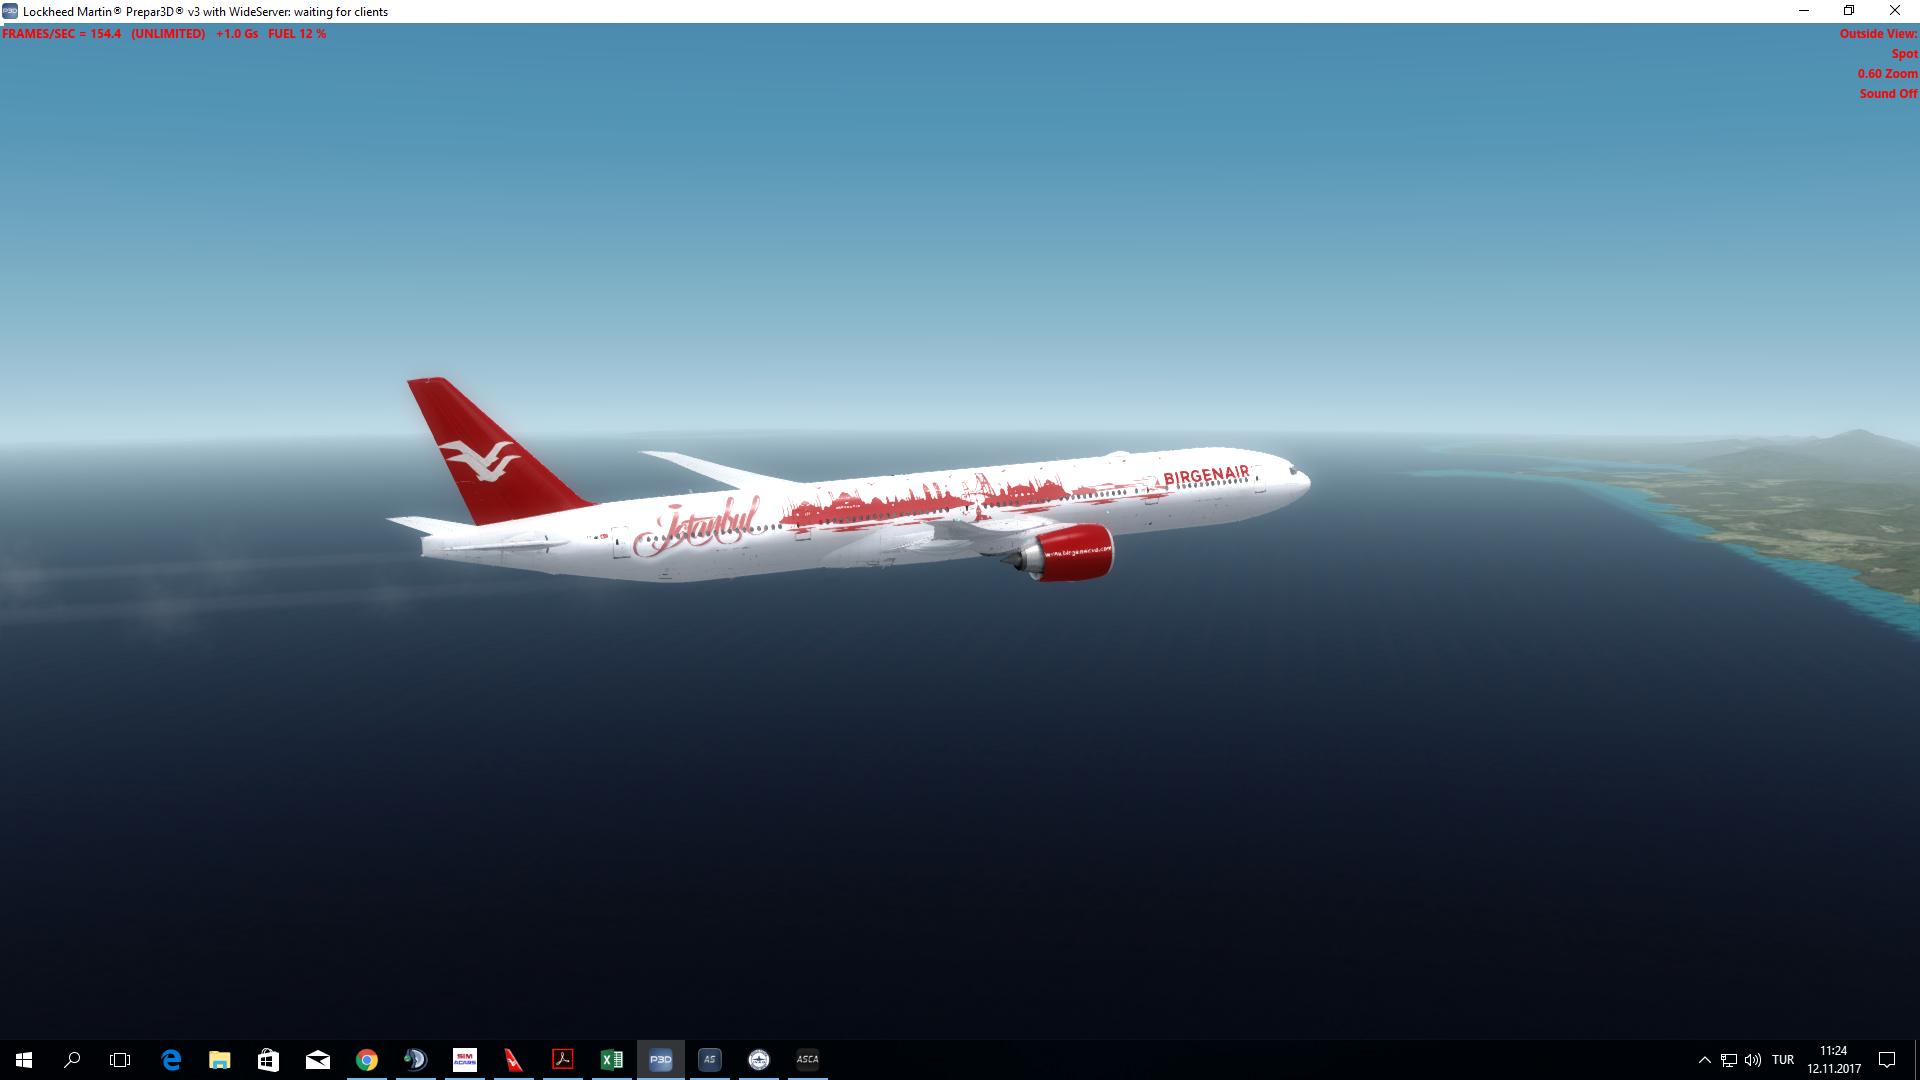 Desktop Screenshot 2017.11.12 - 11.24.30.45